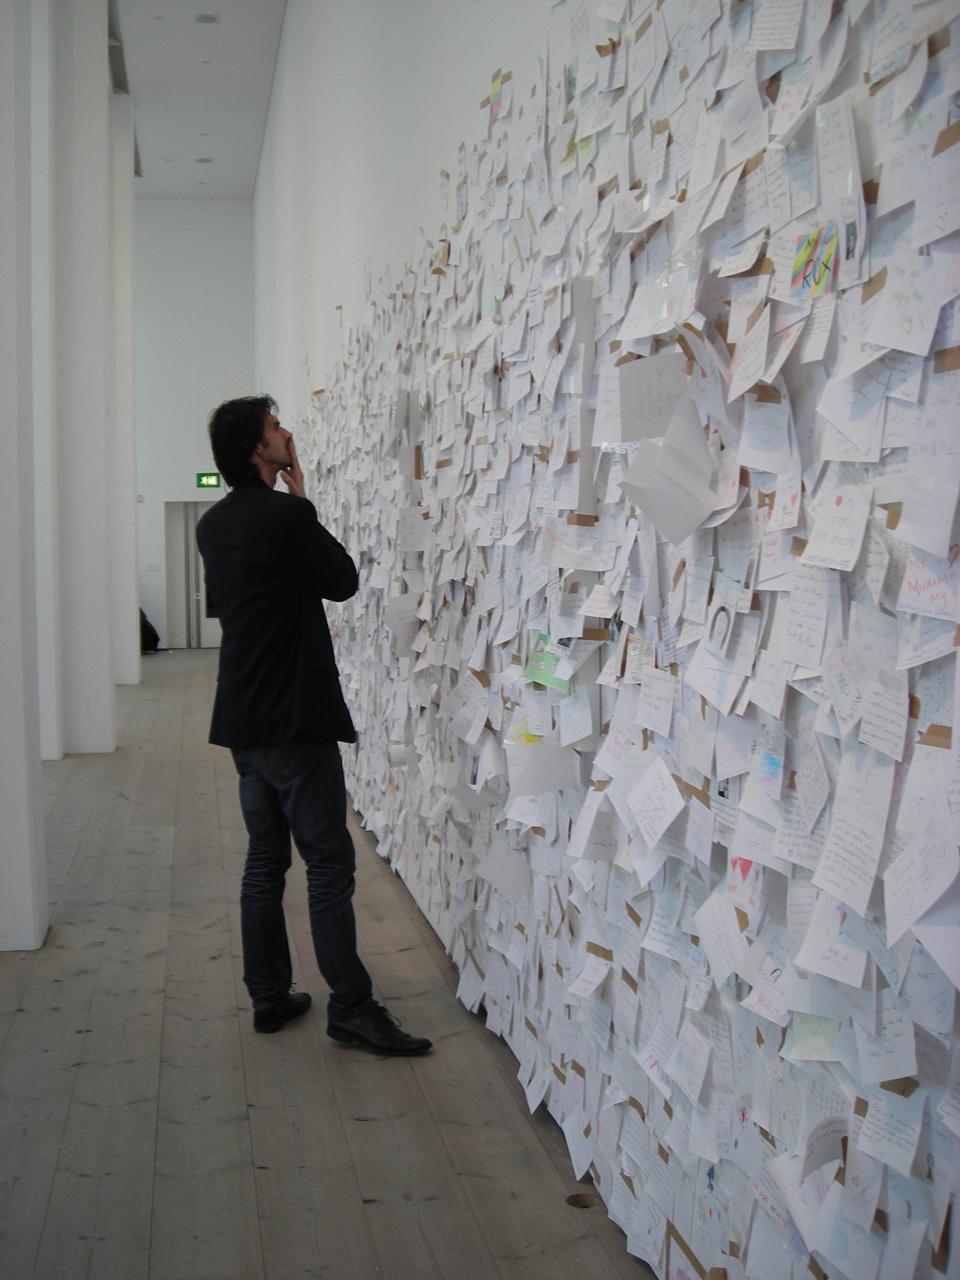 Memory wall by Yoko Ono